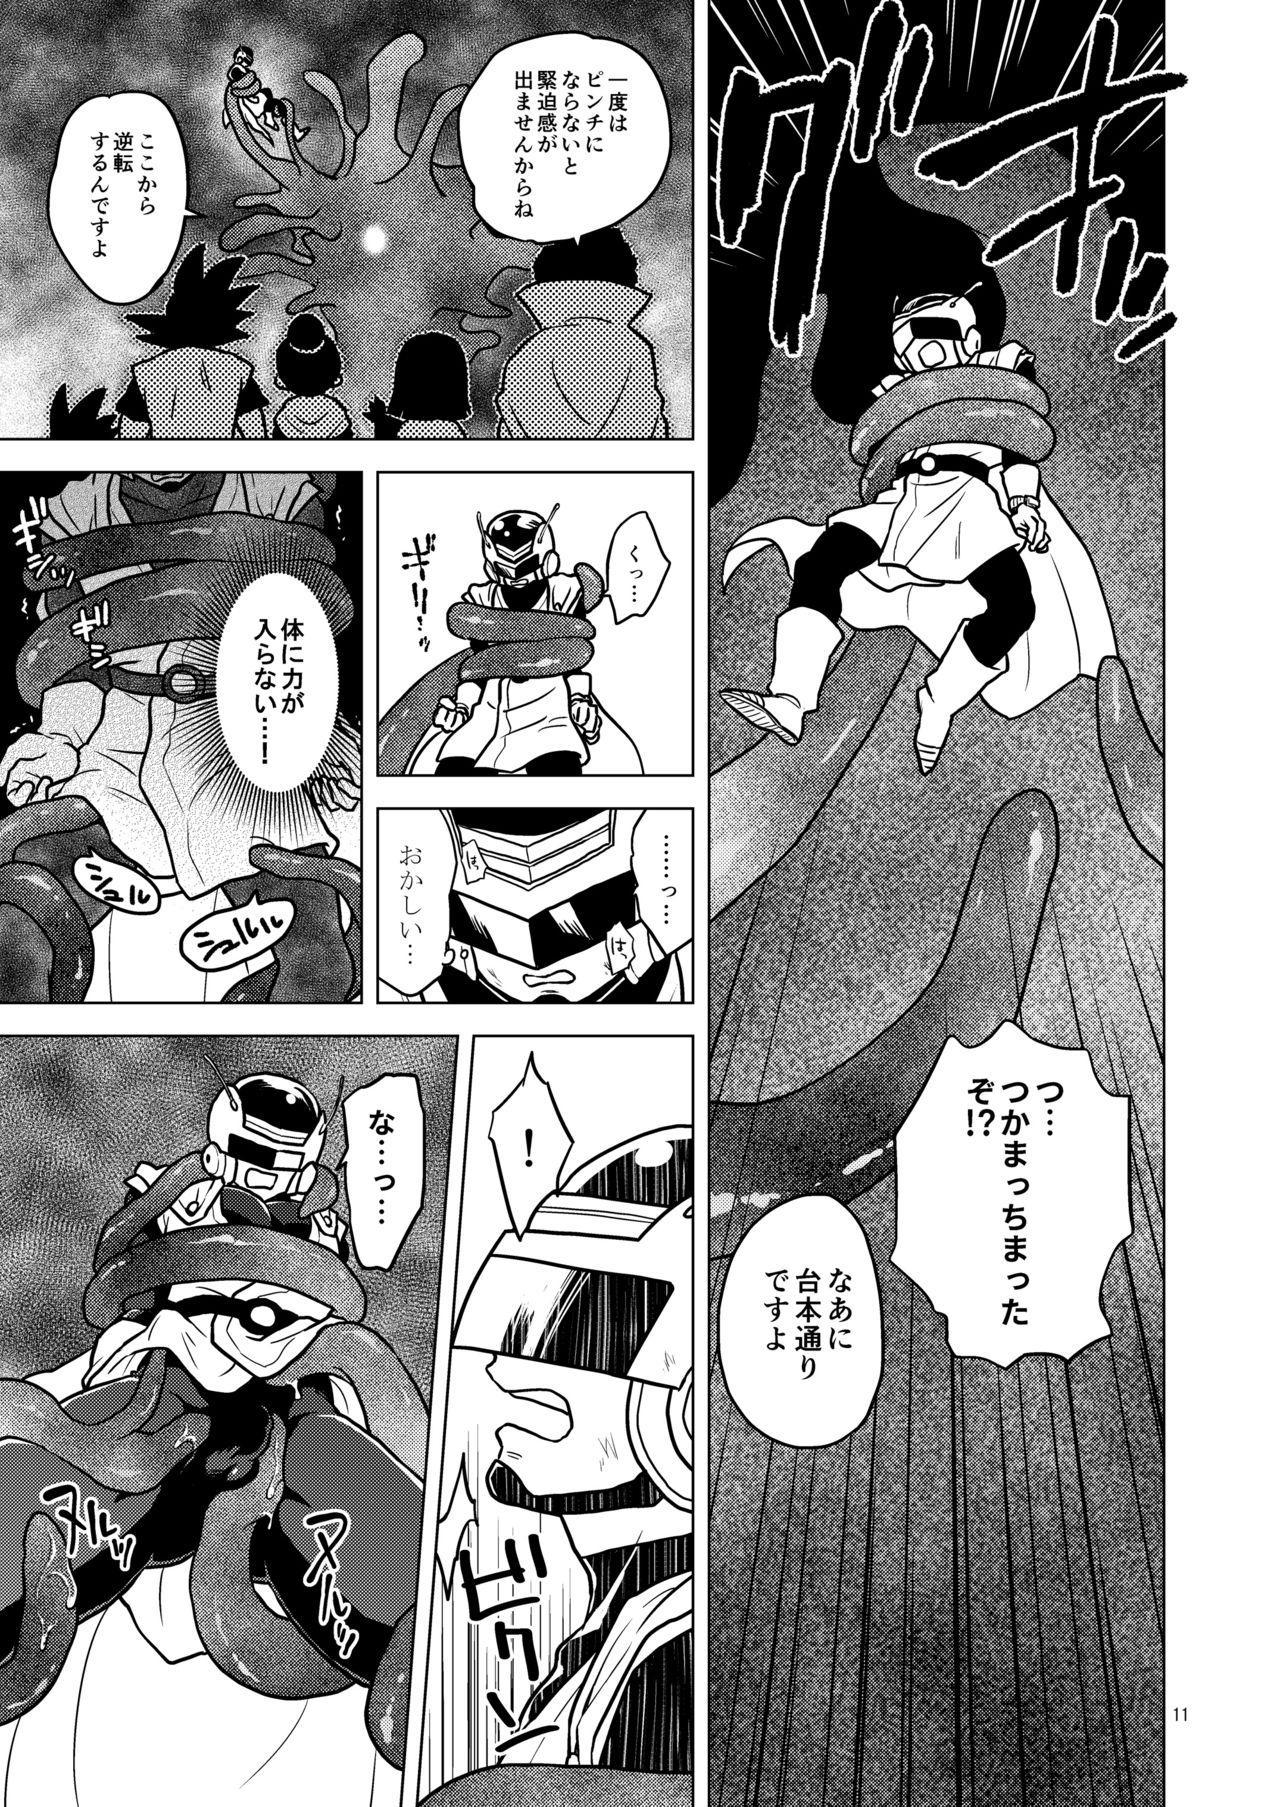 Great Saiyaman vs Shokushu Kaijin 10